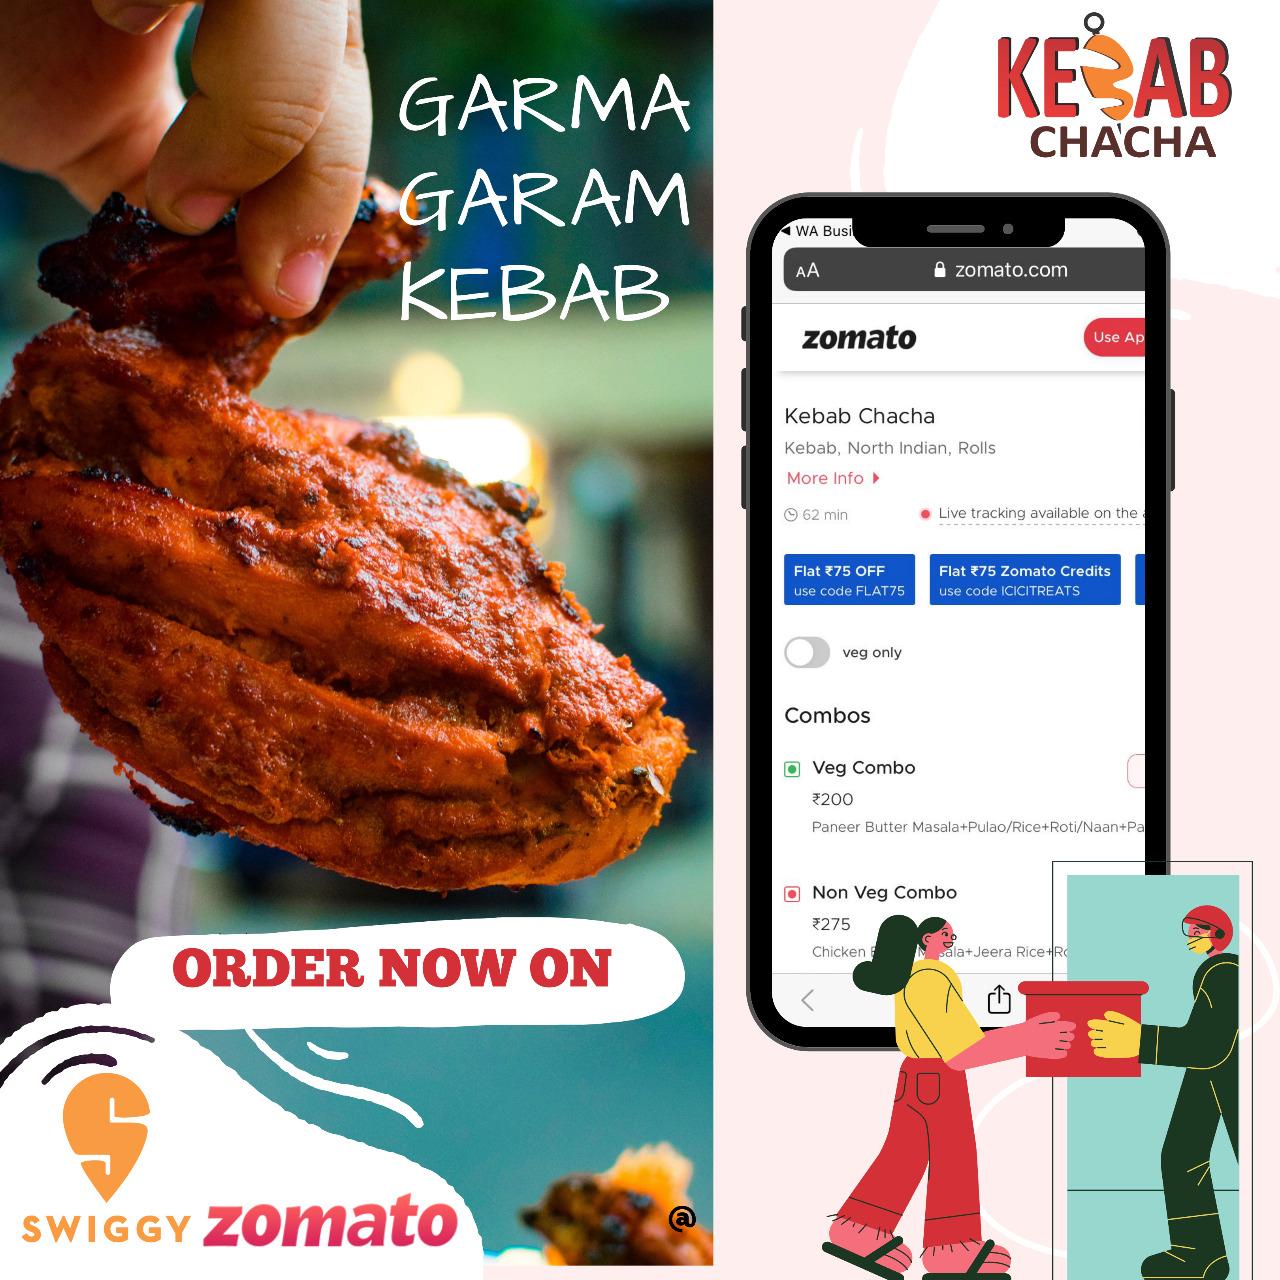 kebab chacha